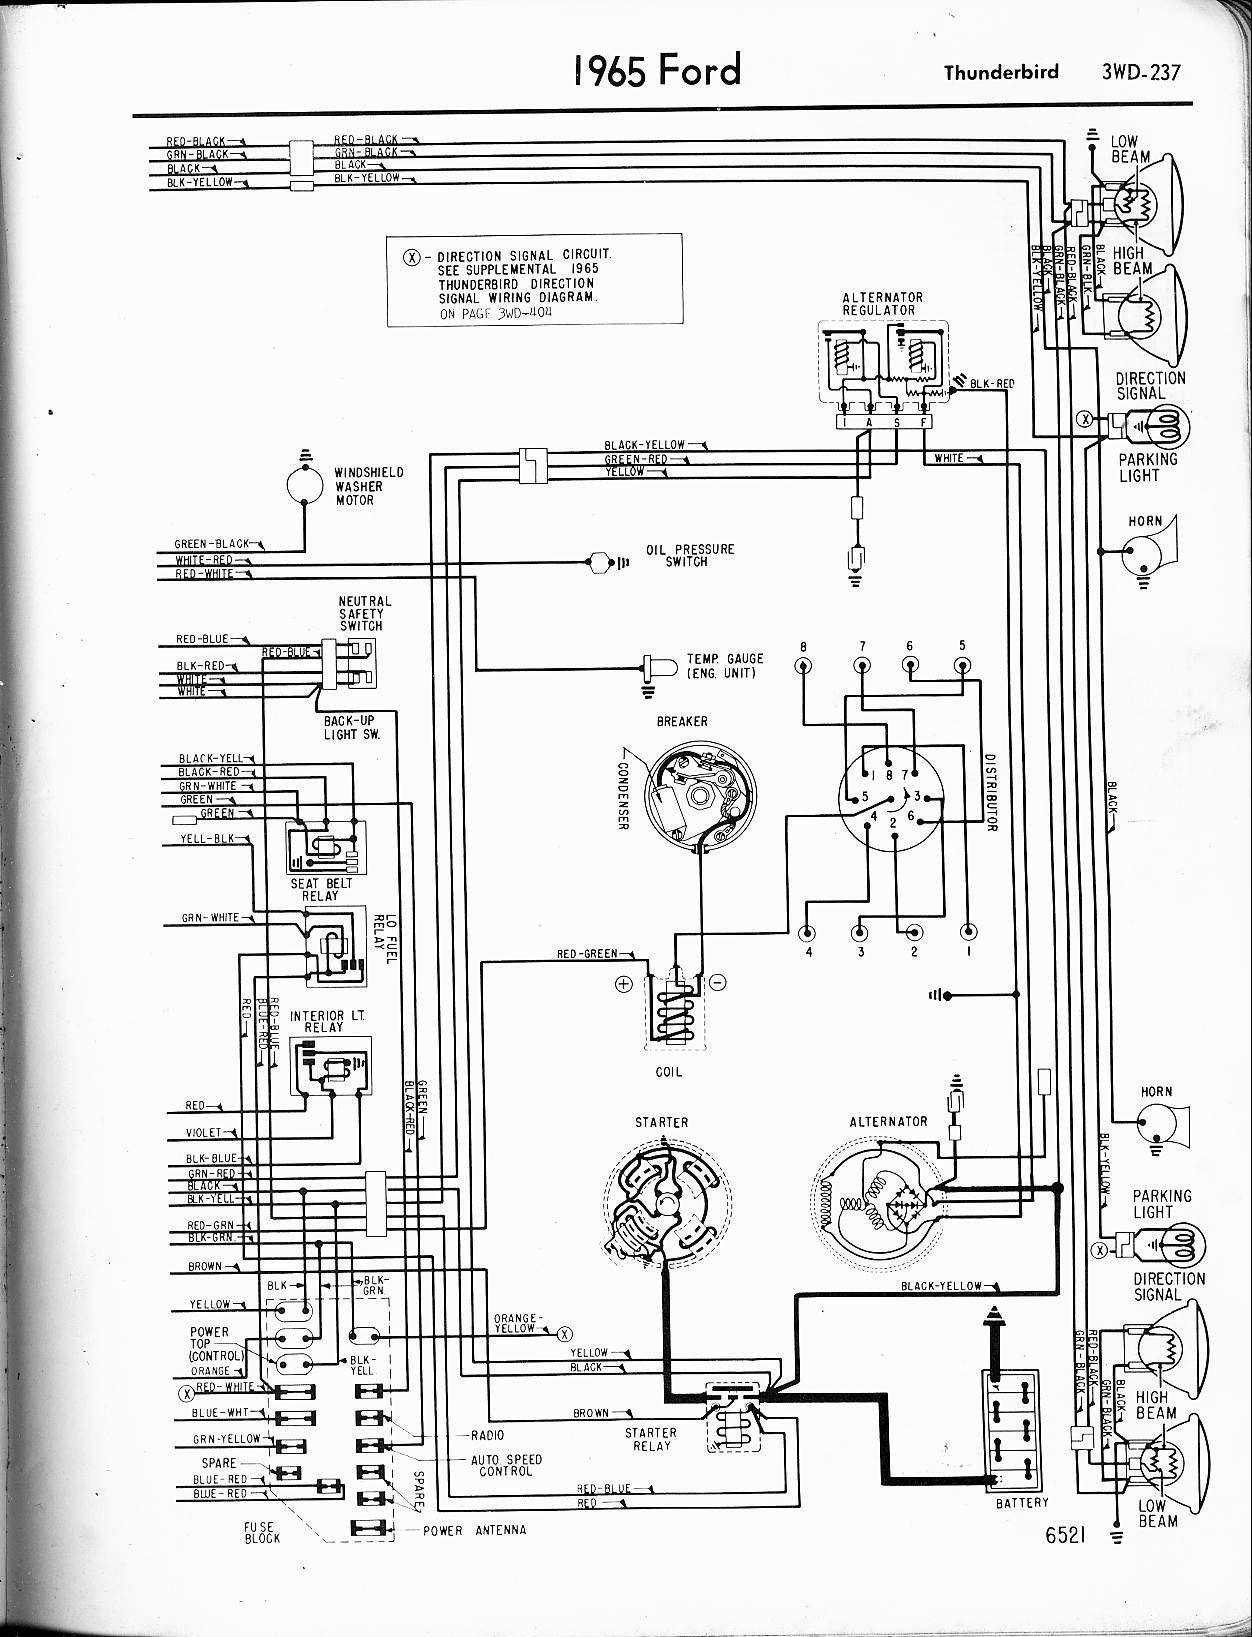 medium resolution of new need wiring diagram diagram wiringdiagram diagramming diagramm visuals visualisation graphical